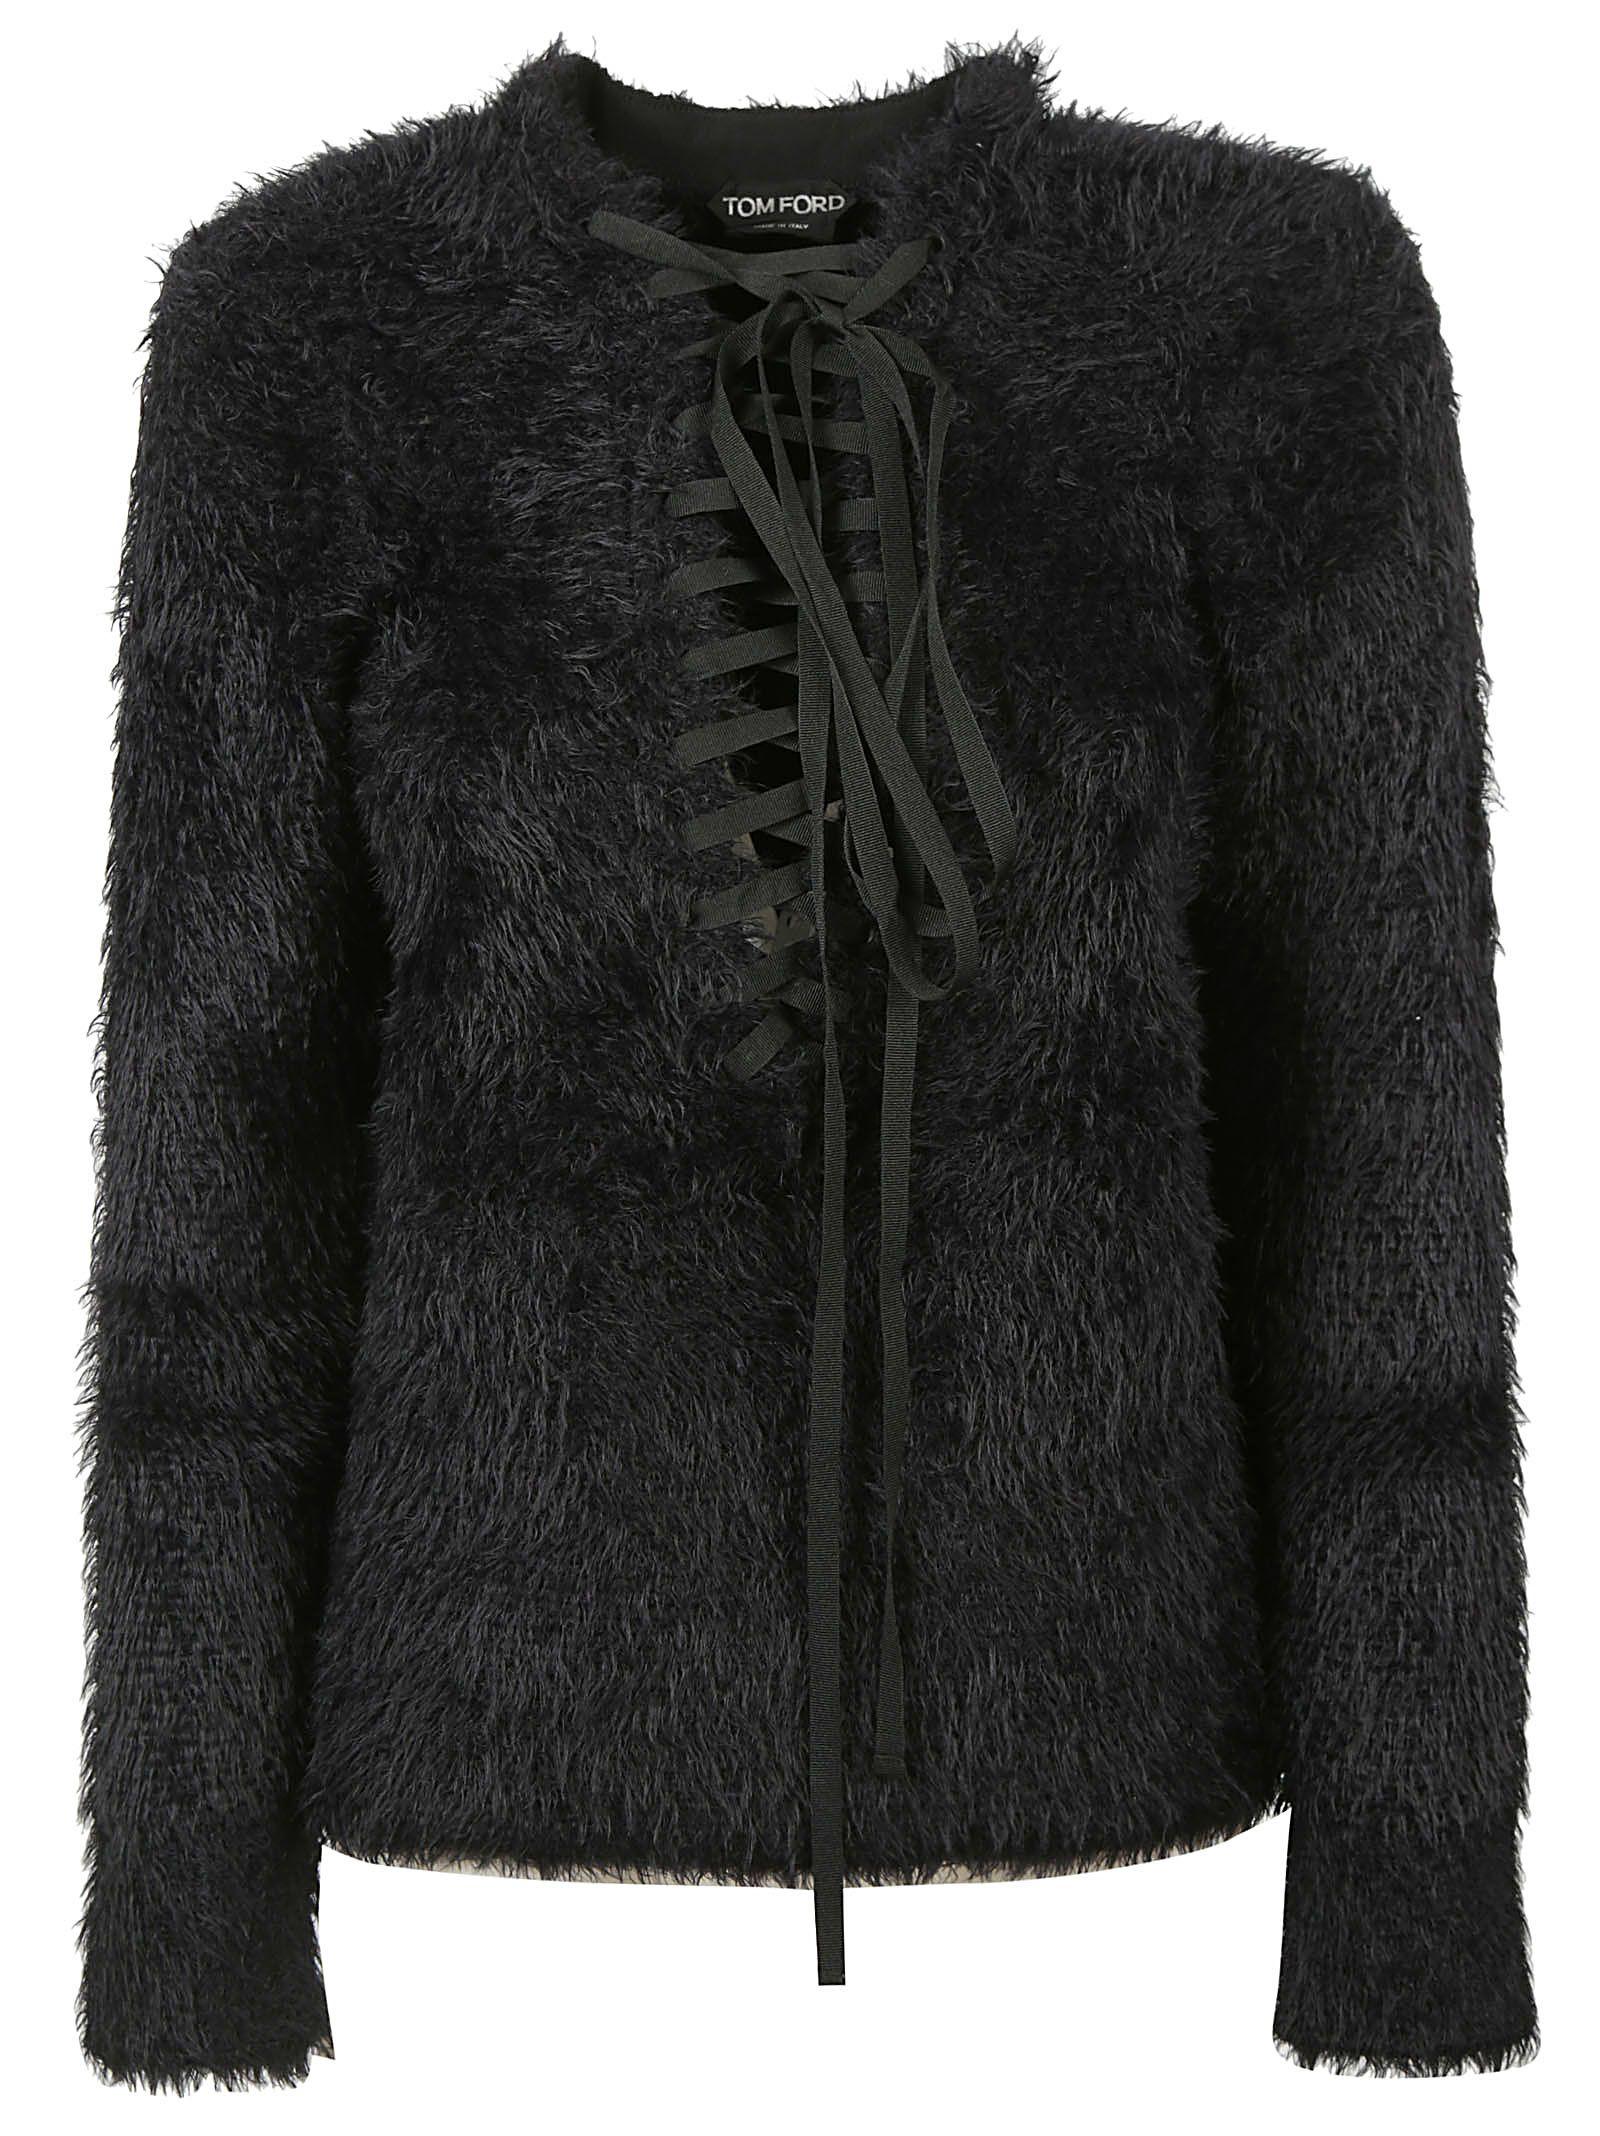 Tom Ford Drawstrings Fur Sweater